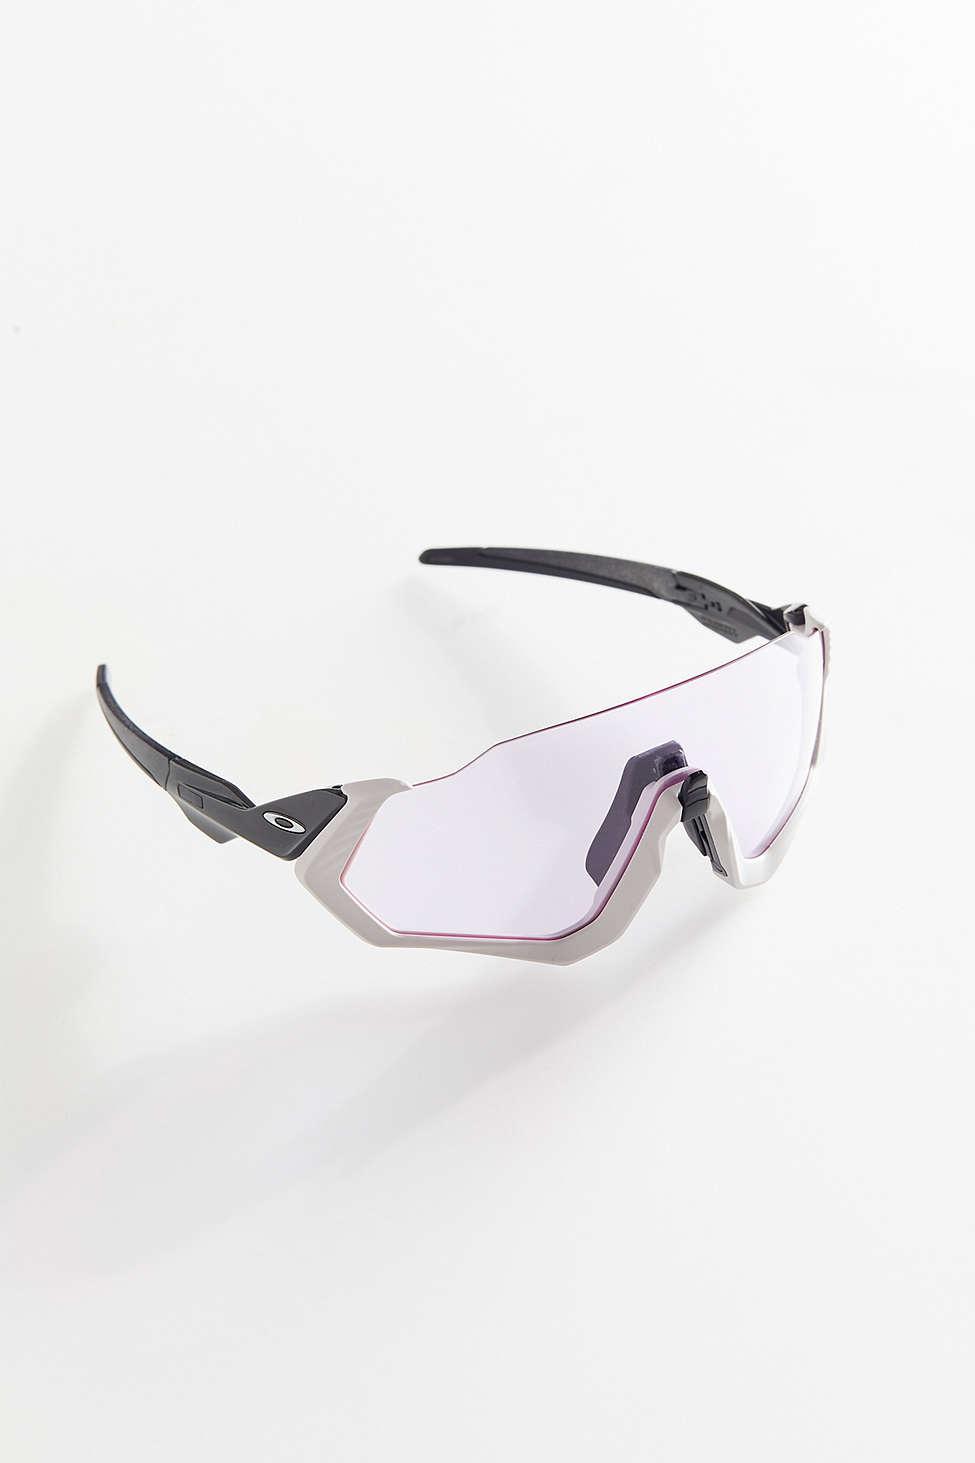 bb8dbd31e2 Lyst - Oakley Flight Jacket Carbon Sunglasses in Pink